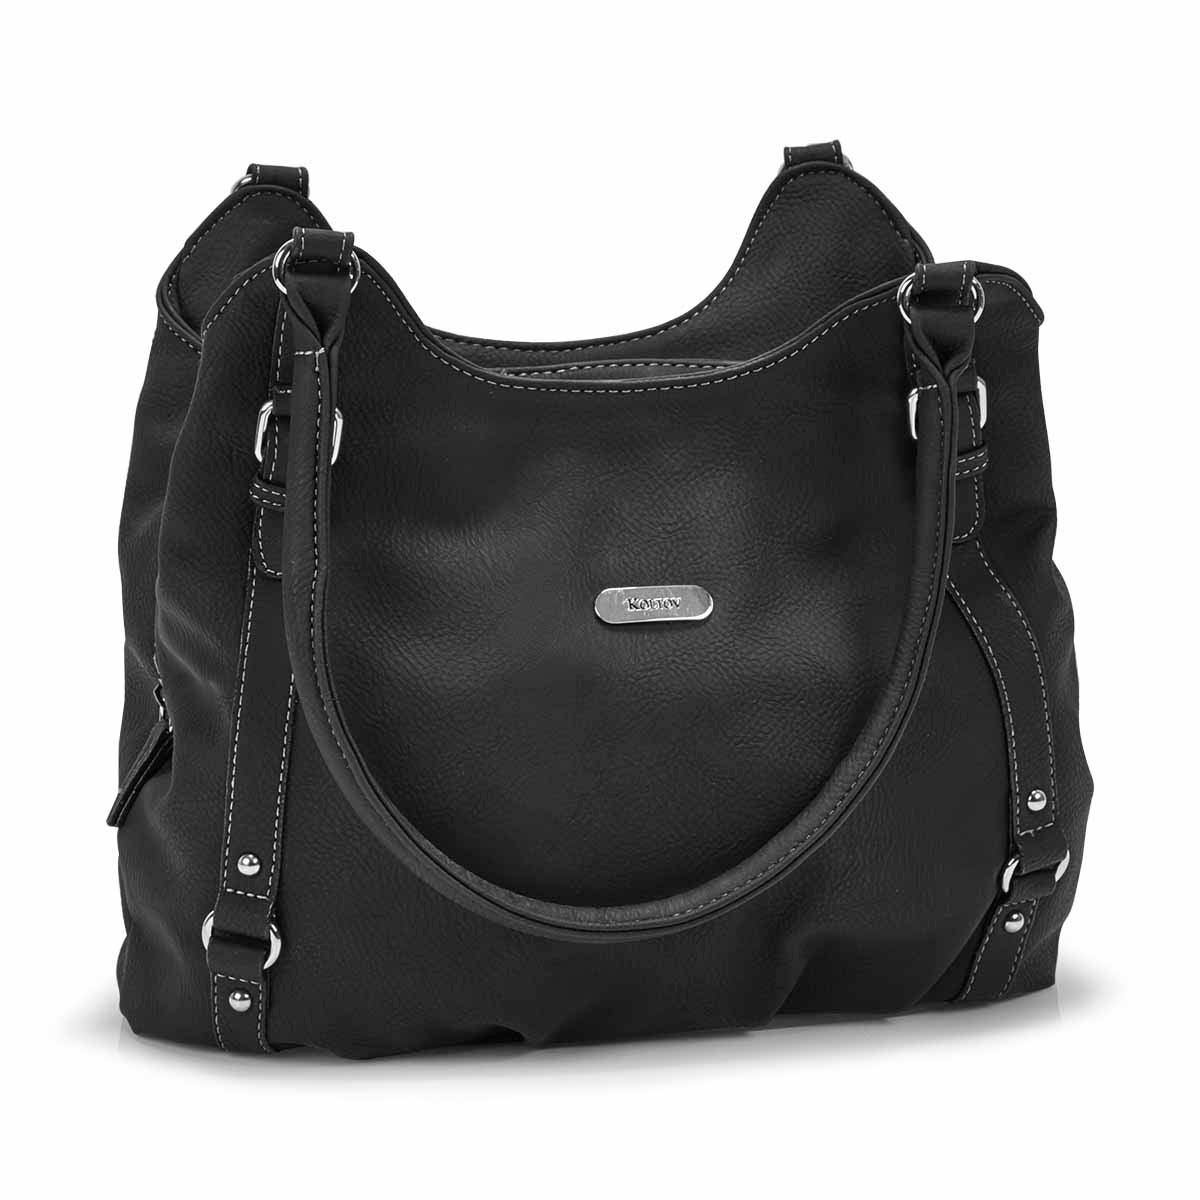 Lds Sydney black hobo bag